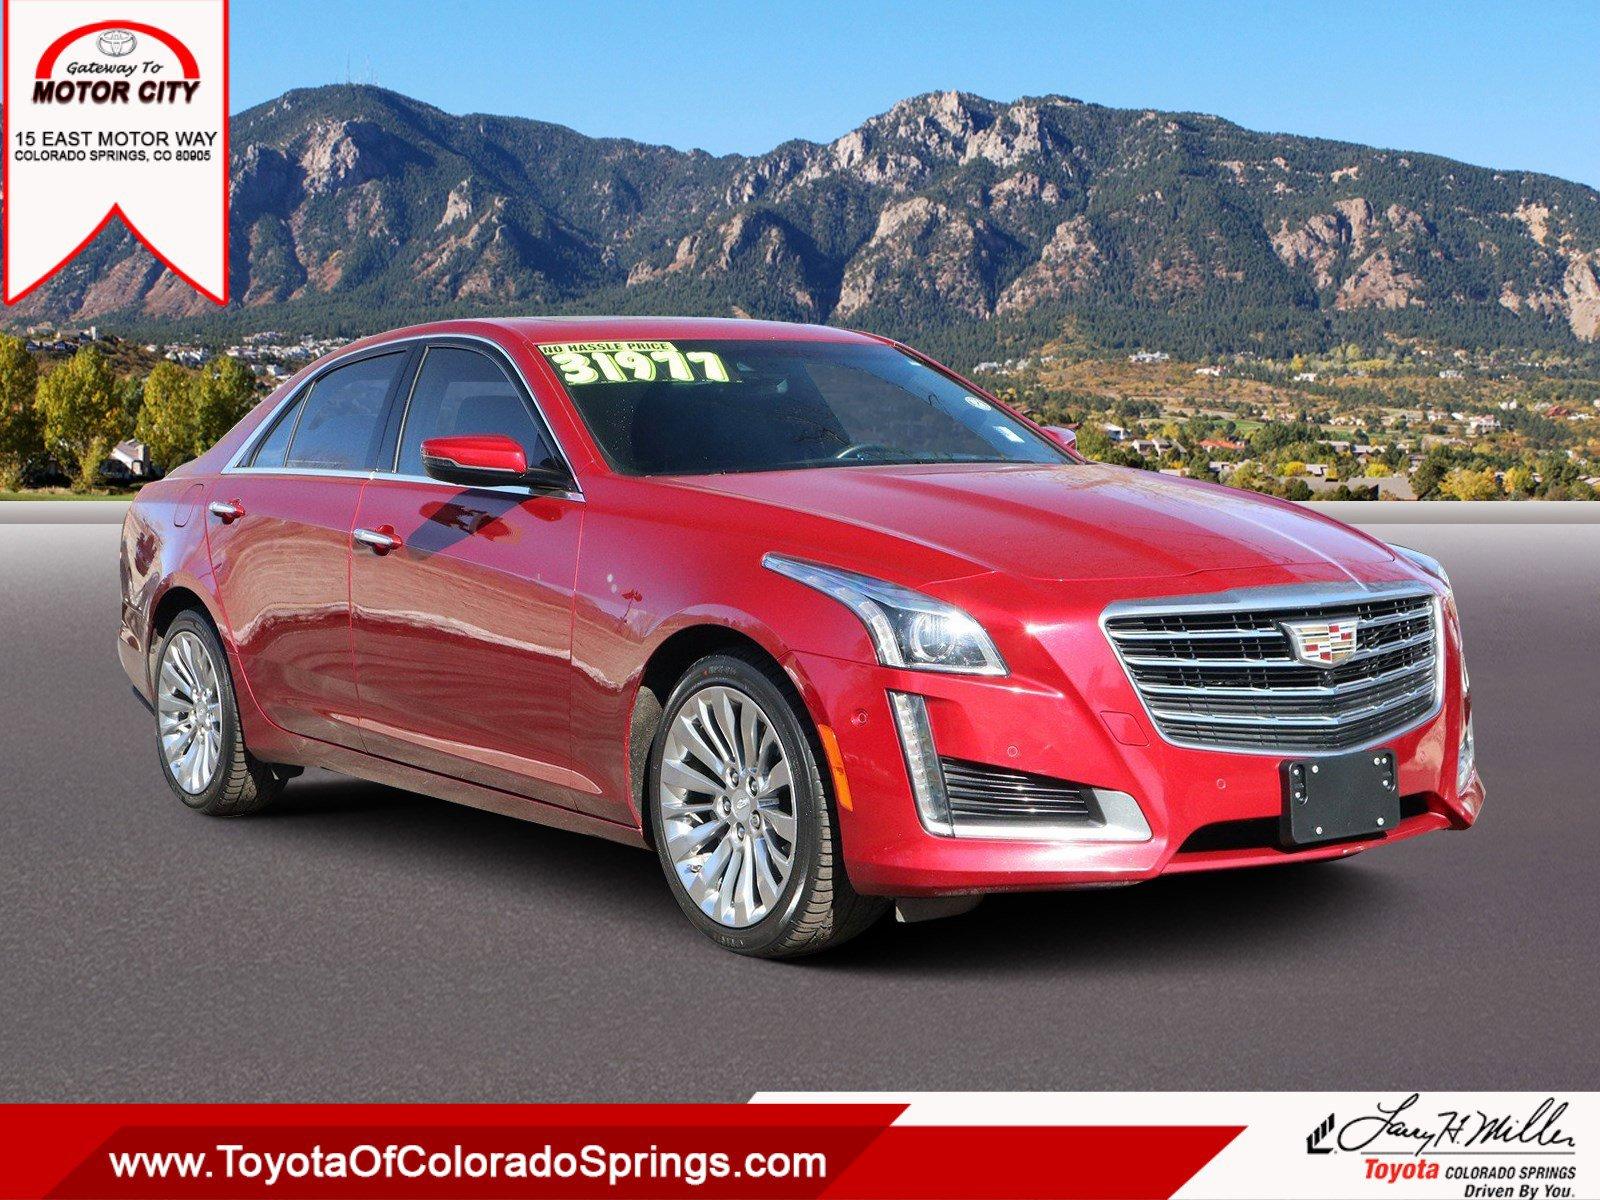 2017 Cadillac CTS Premium Luxury AWD image